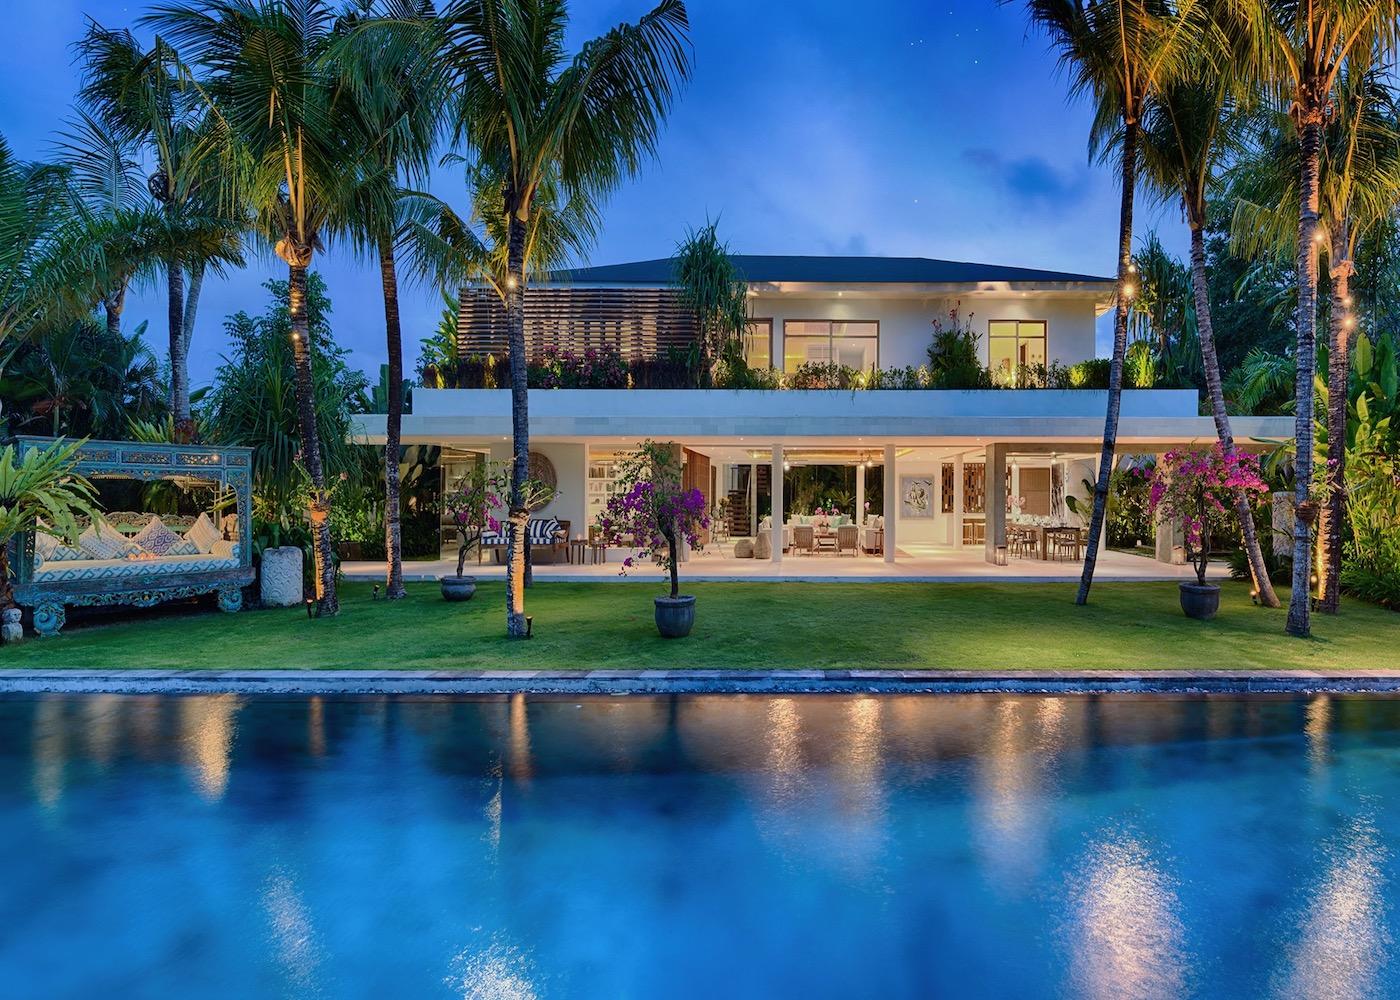 Villa Zambala in Canggu - the best family-friendly villas in Bali, Indonesia